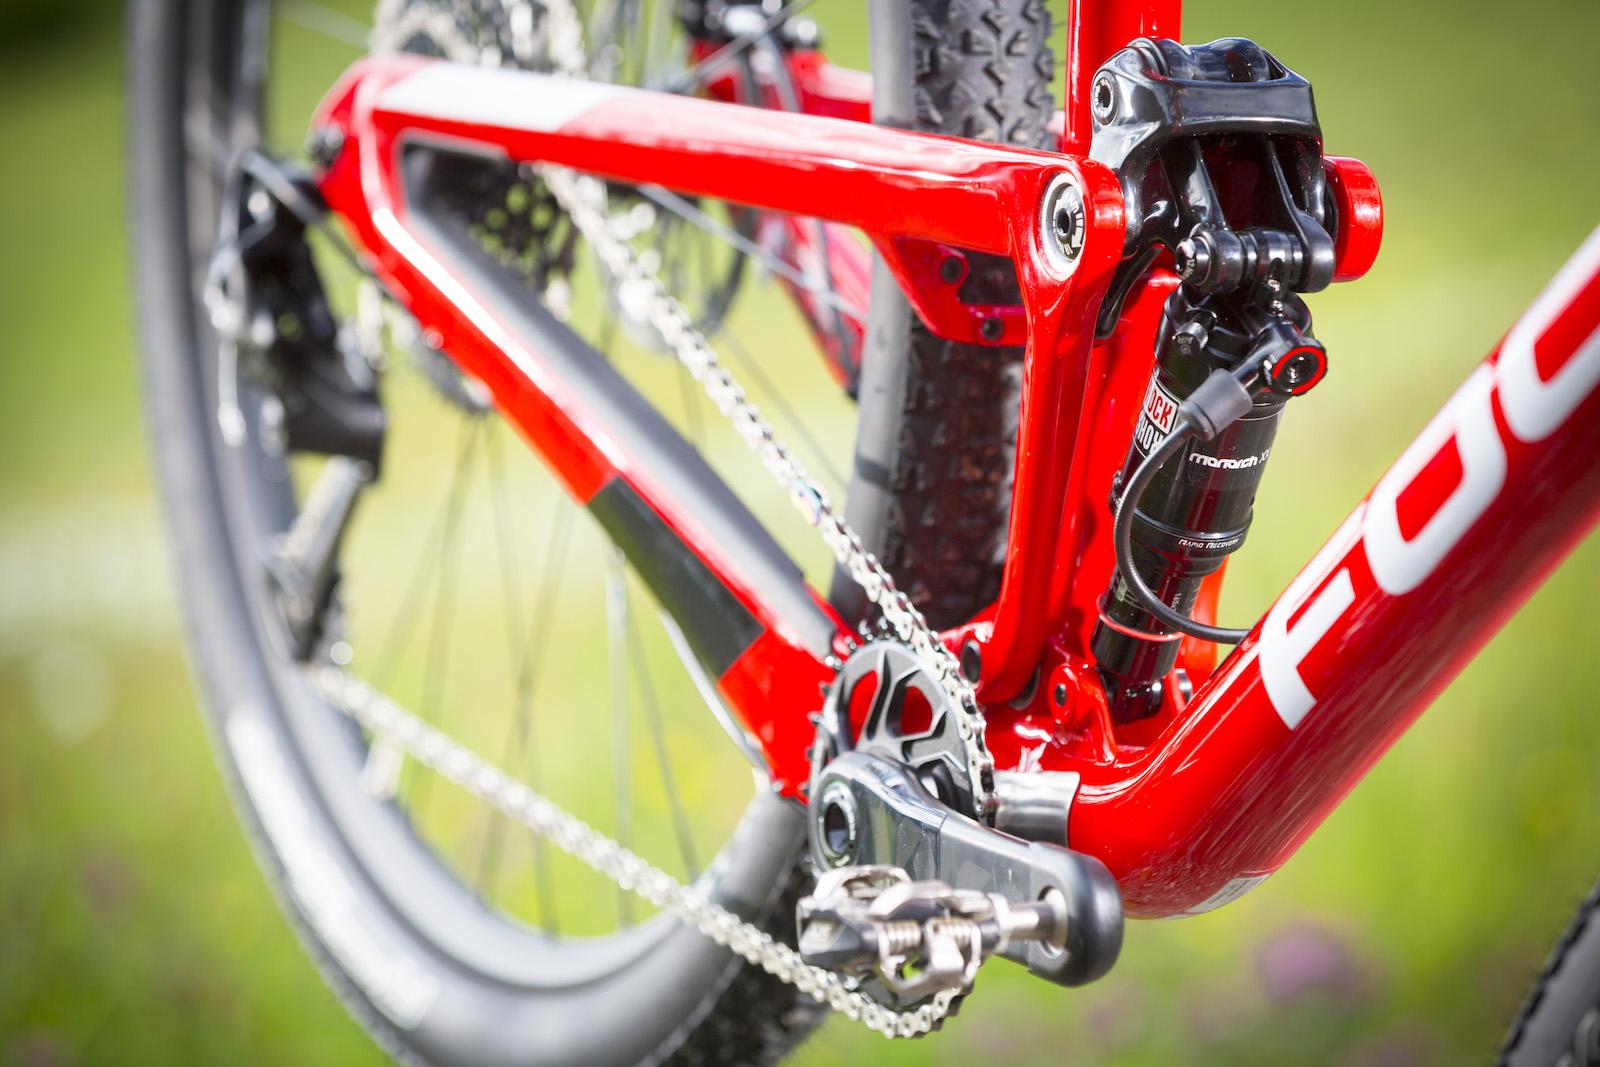 GD255838_Focus Morzine 2016 Bikes_One